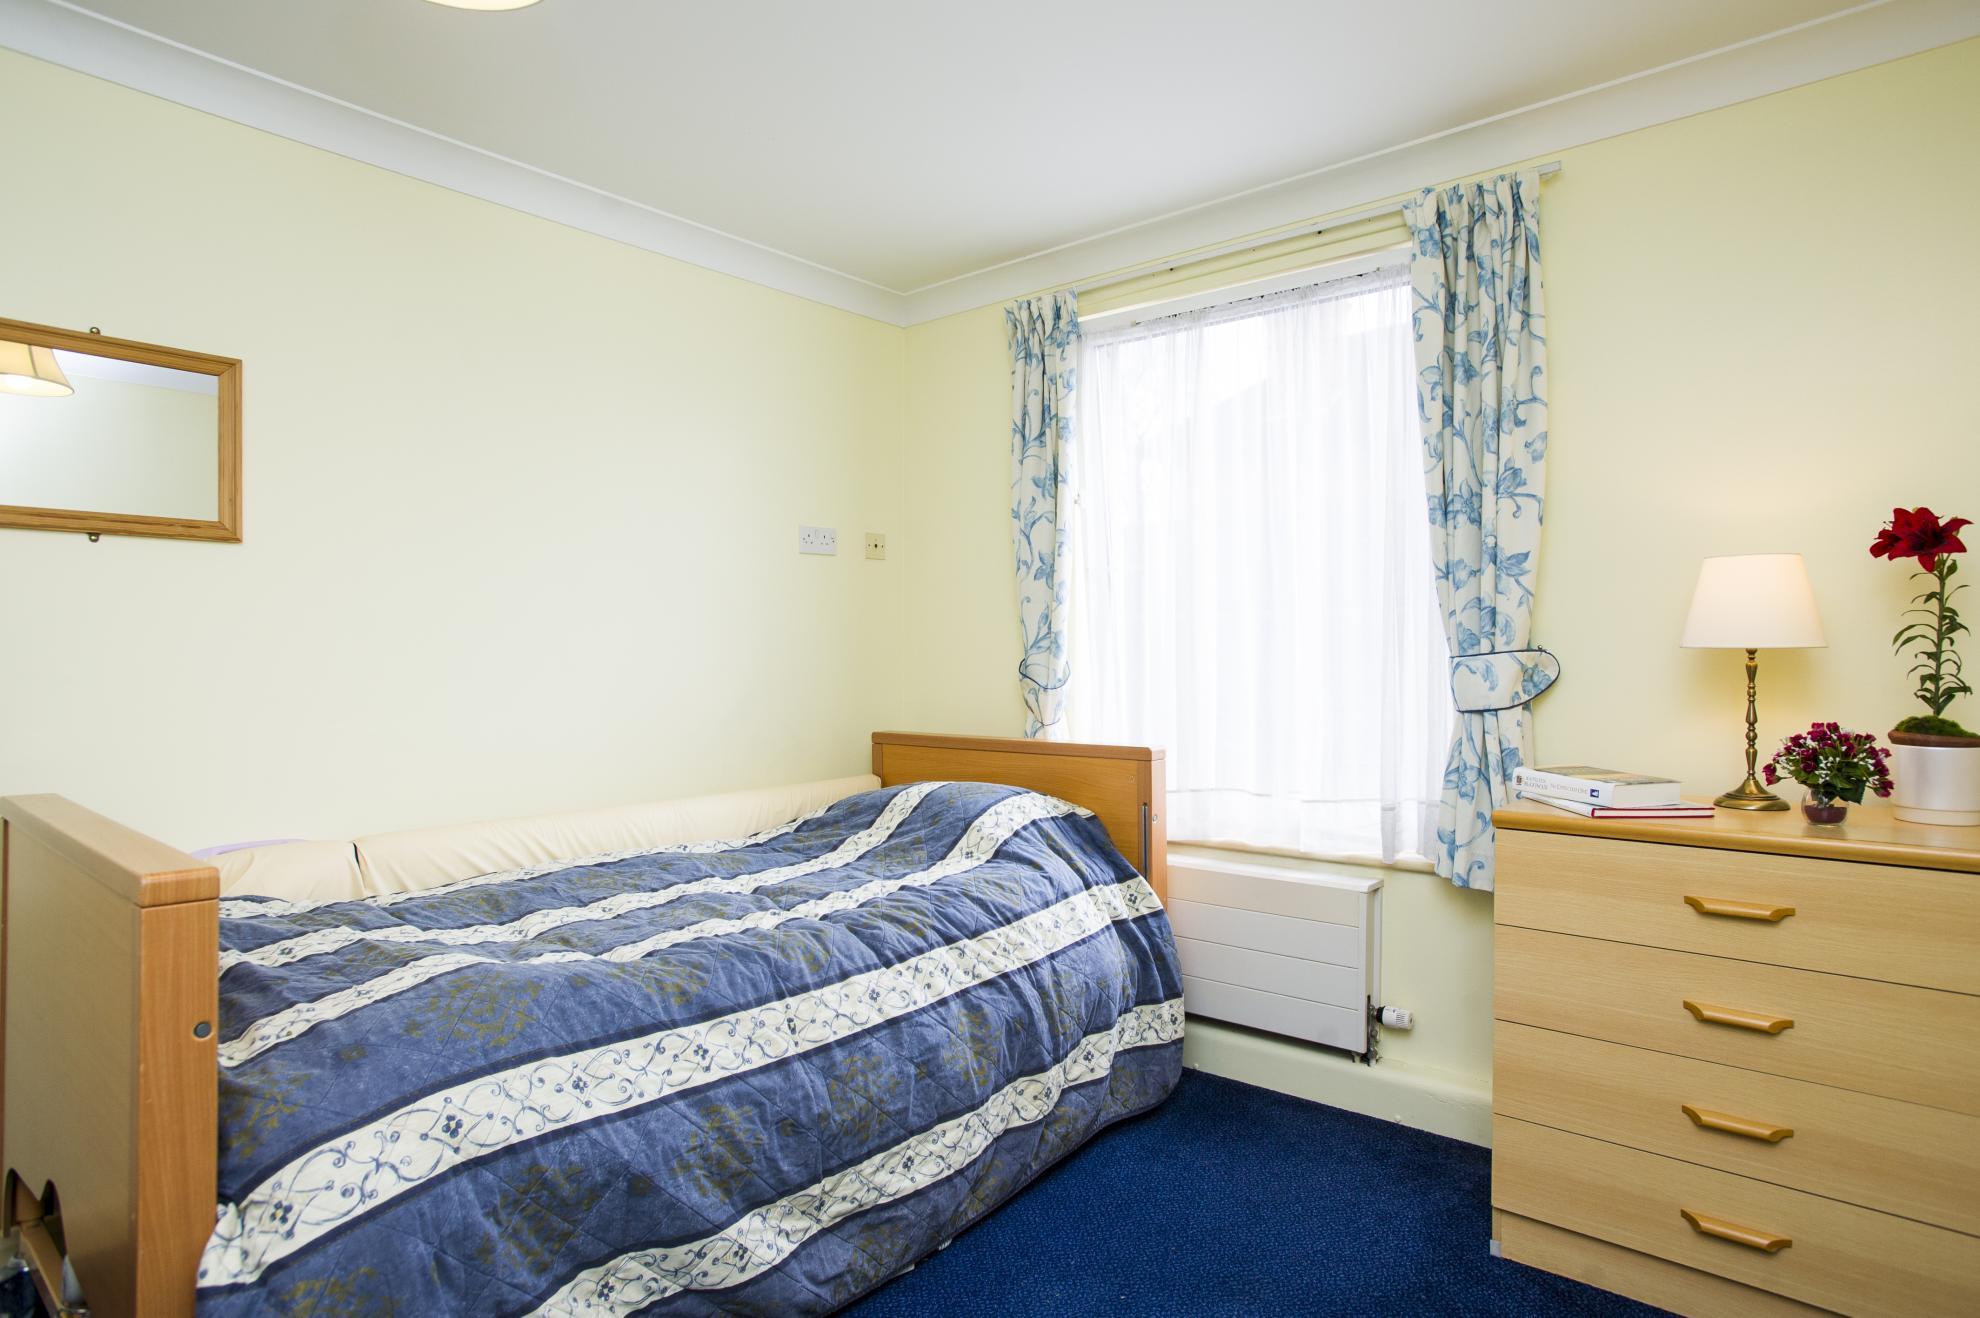 Rowanweald Residential and Nursing Home